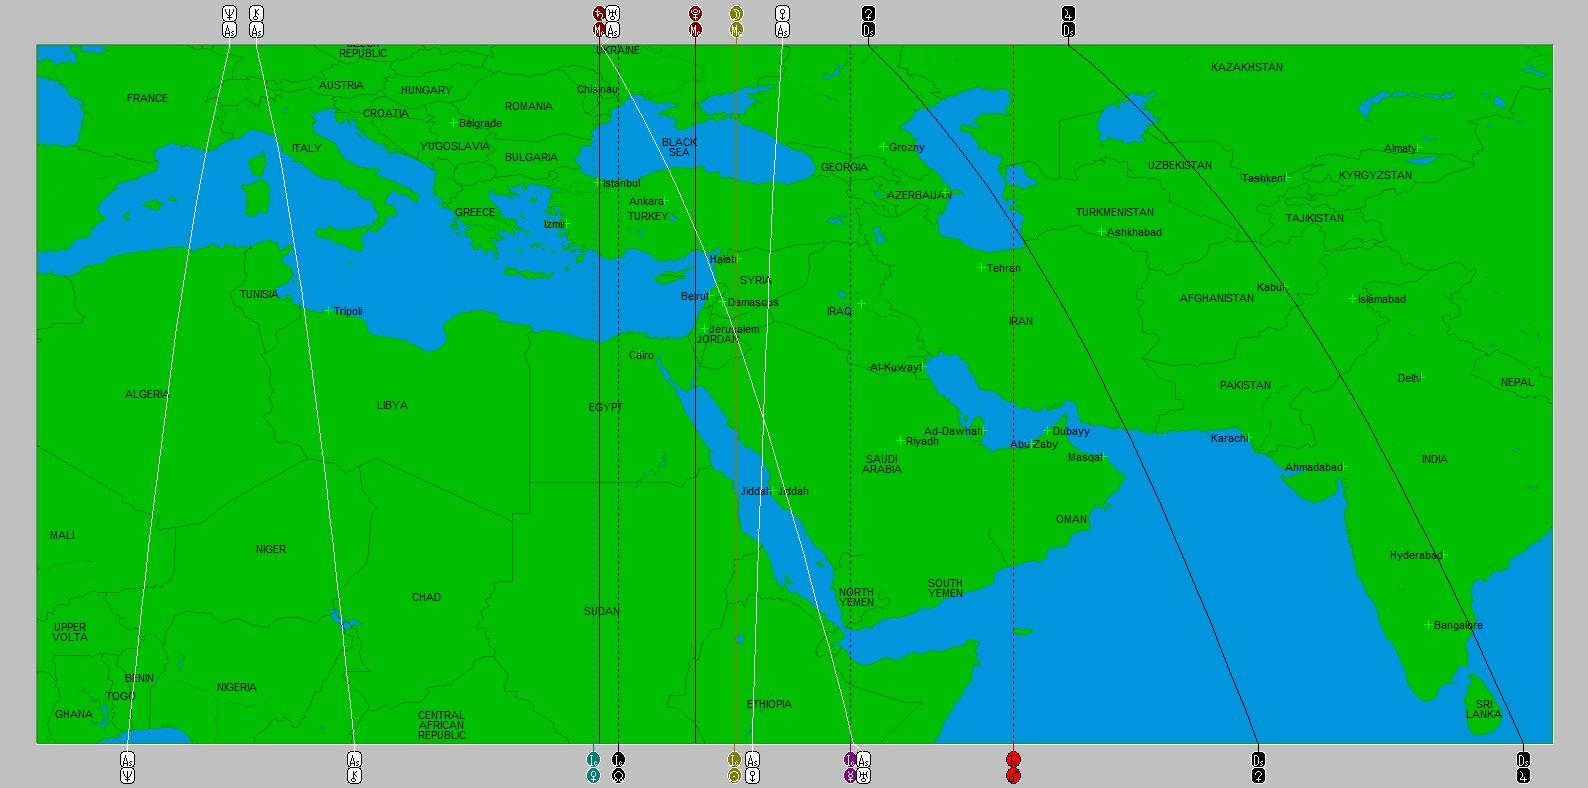 astro charto lunar ecl jul 2019